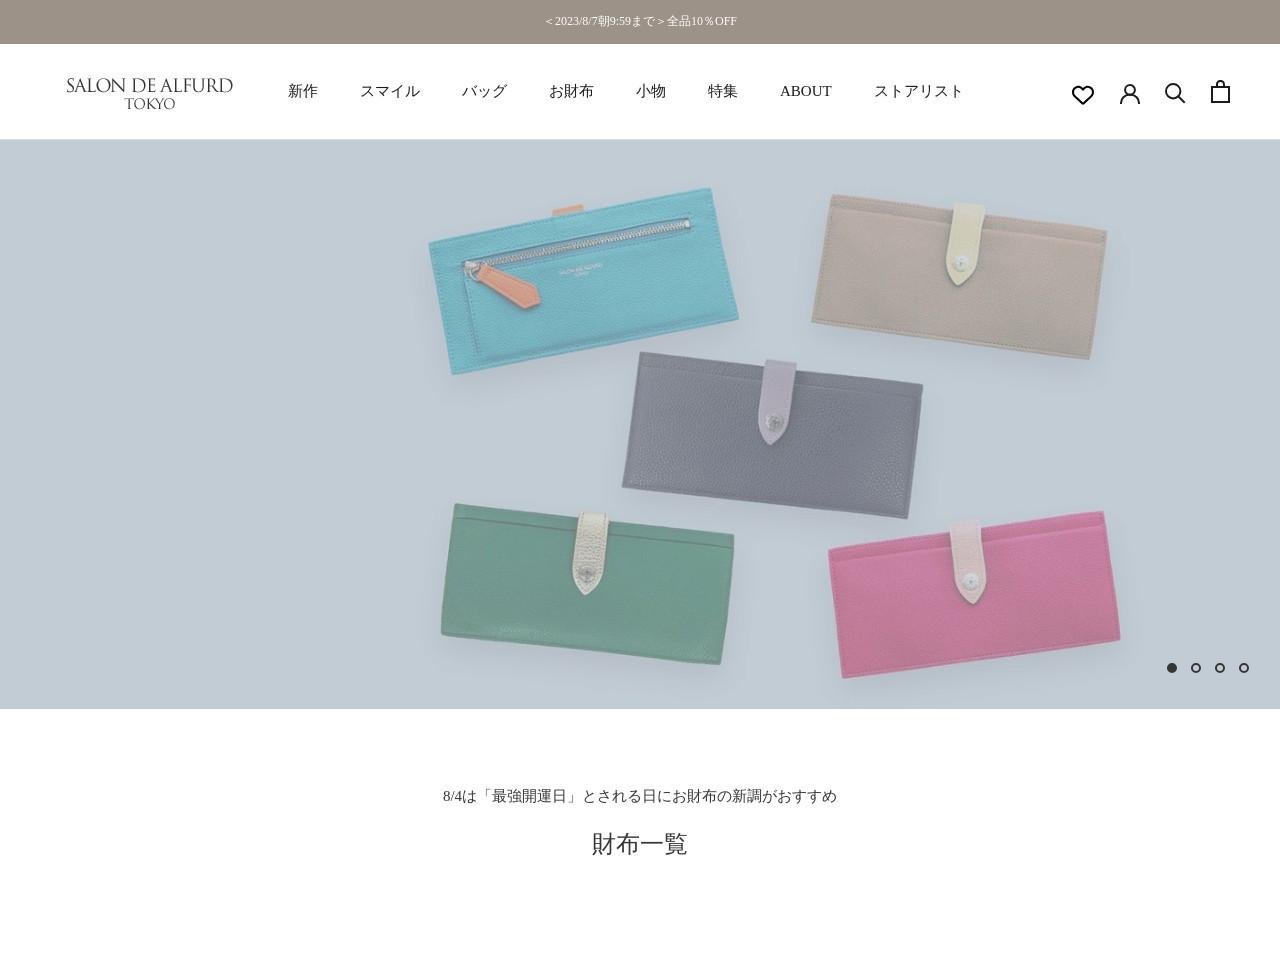 SALON DE ALFURD サロンドアルファード公式オンラインショップ(通販)。東京恵比寿のスマイルマークと上質&軽量レザーバッグブランド。